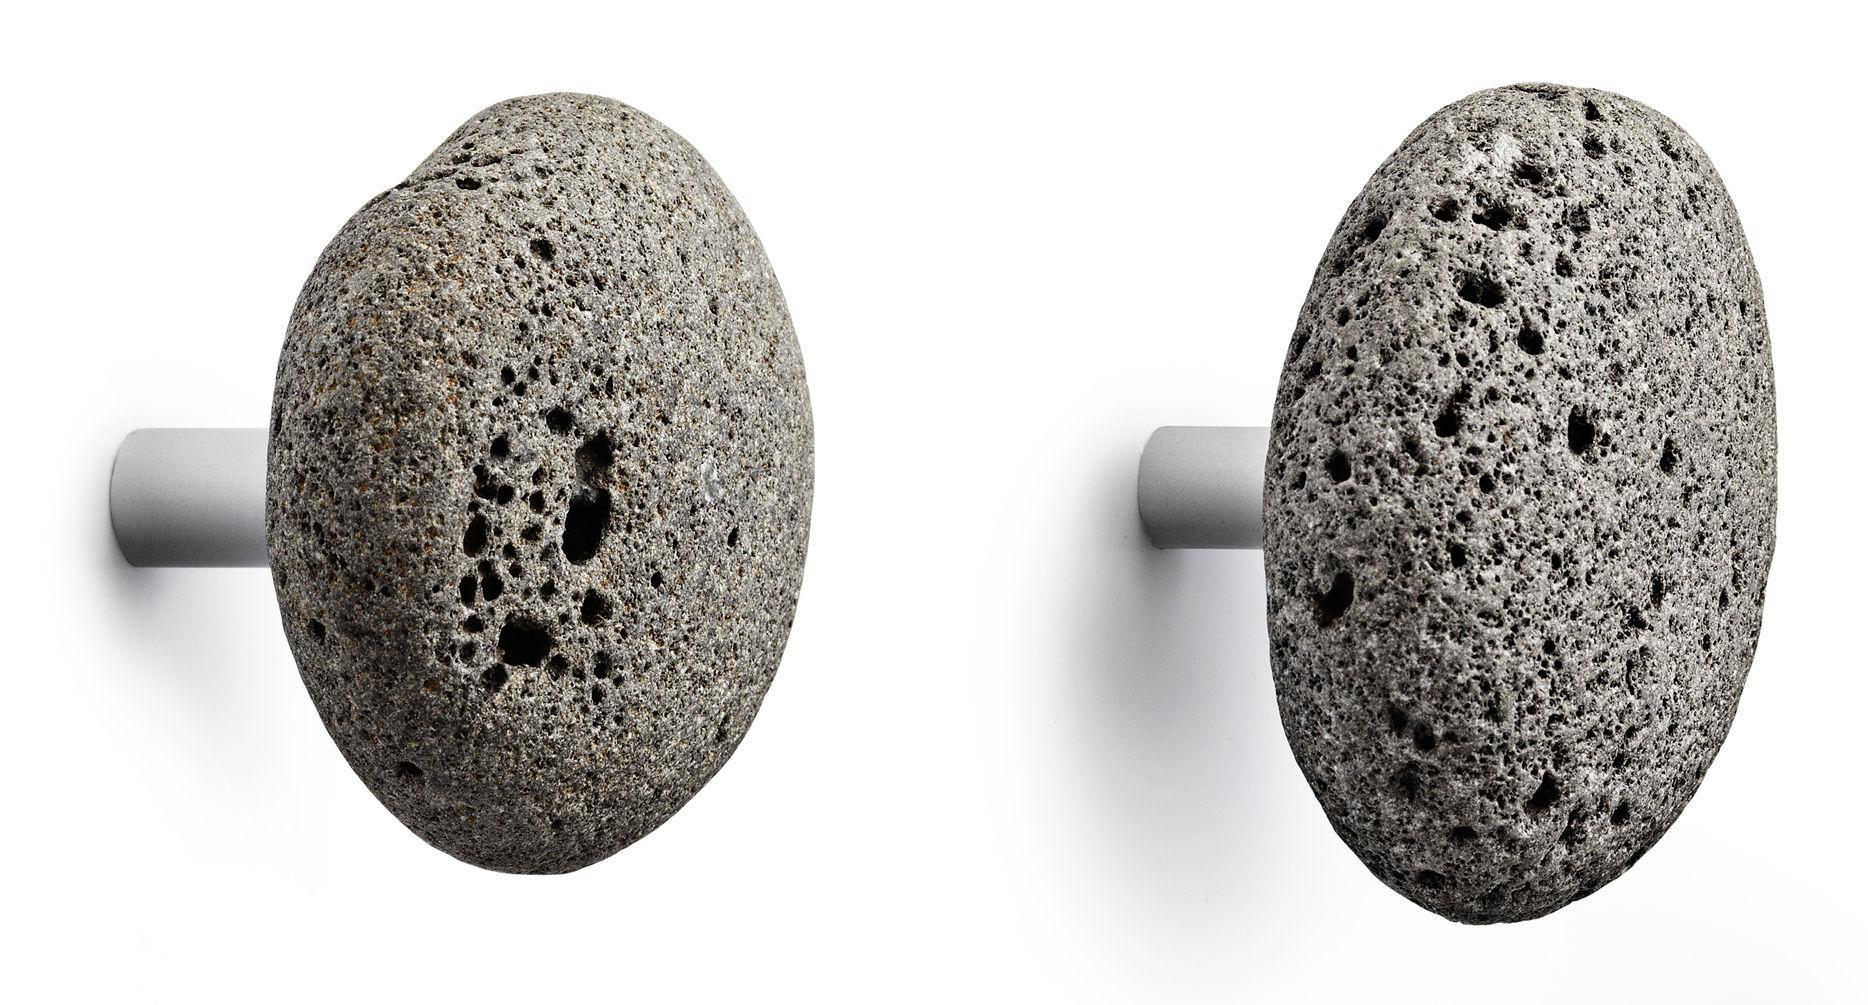 Furniture - Coat Racks & Pegs - Stone Hook by Normann Copenhagen - Grey - Stainless steel, Stone